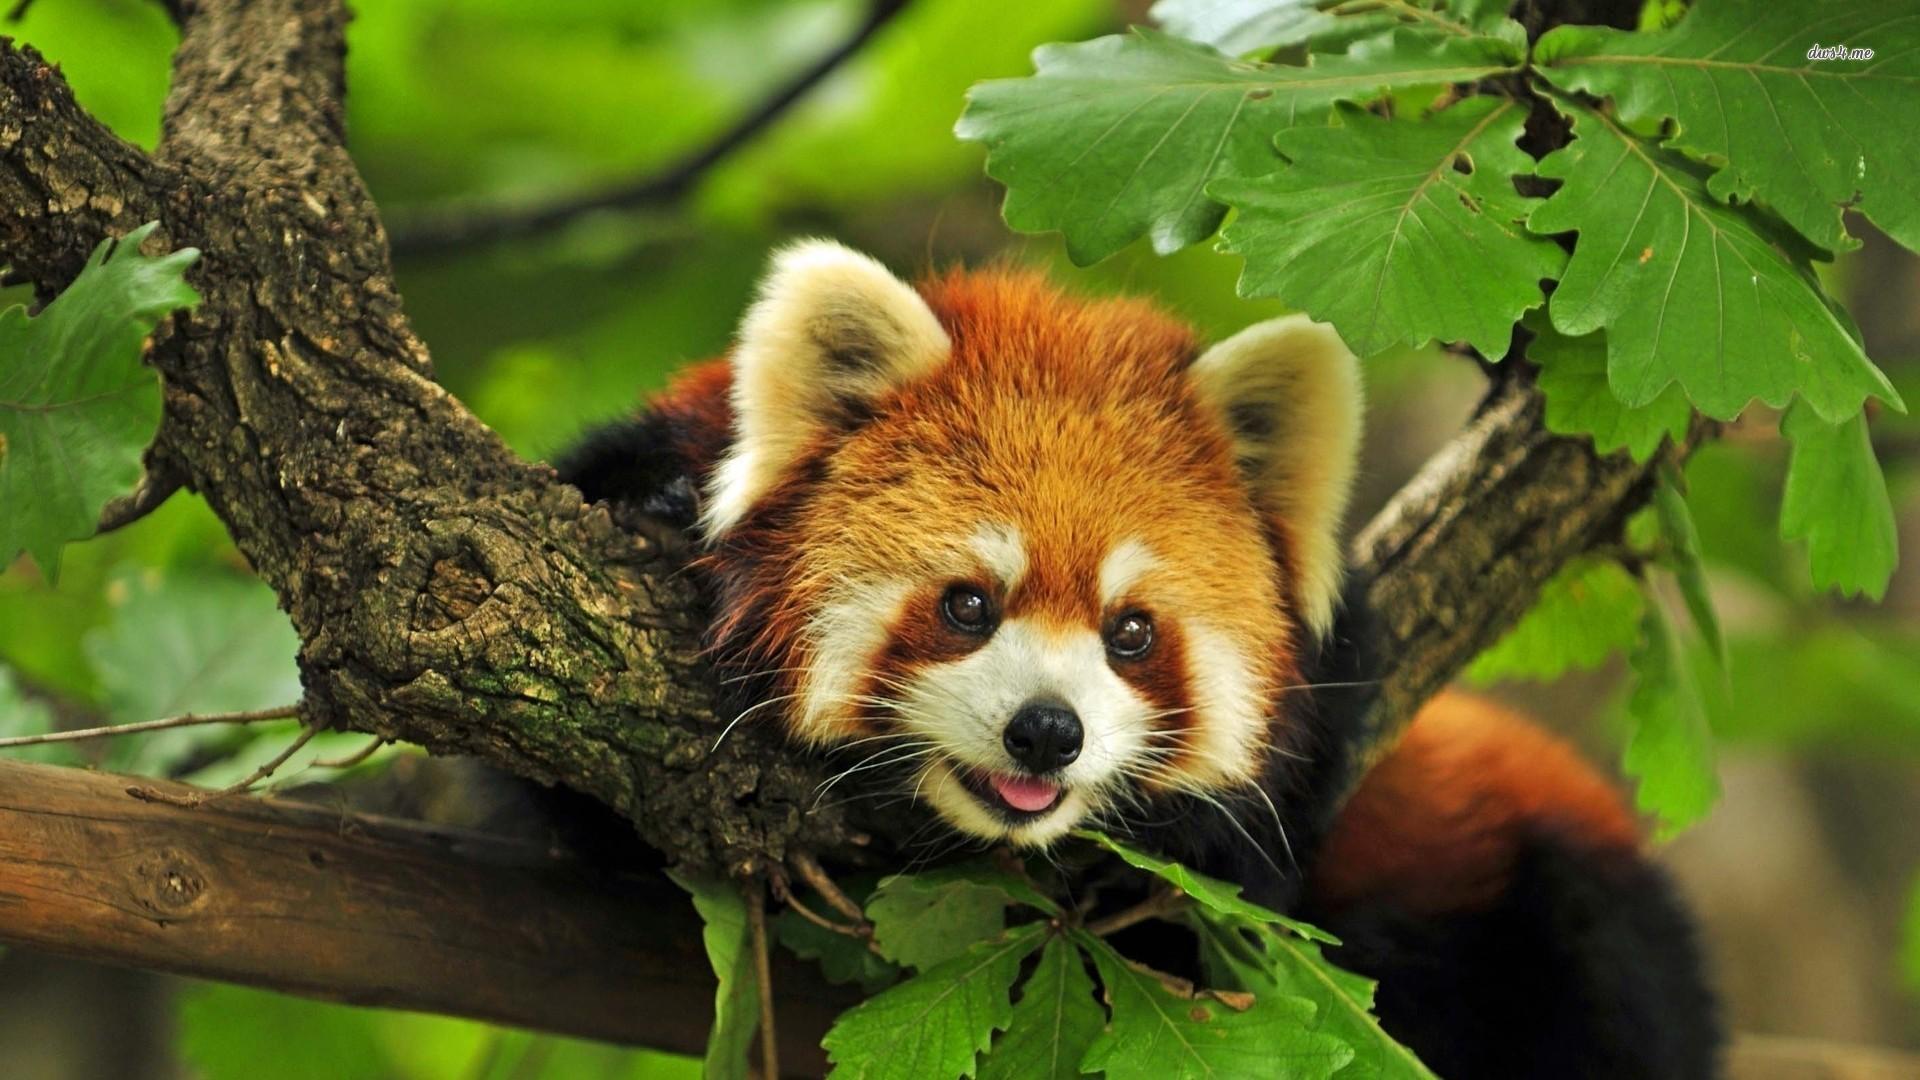 Red Panda HD Wide Wallpaper for Widescreen (67 Wallpapers) – HD Wallpapers